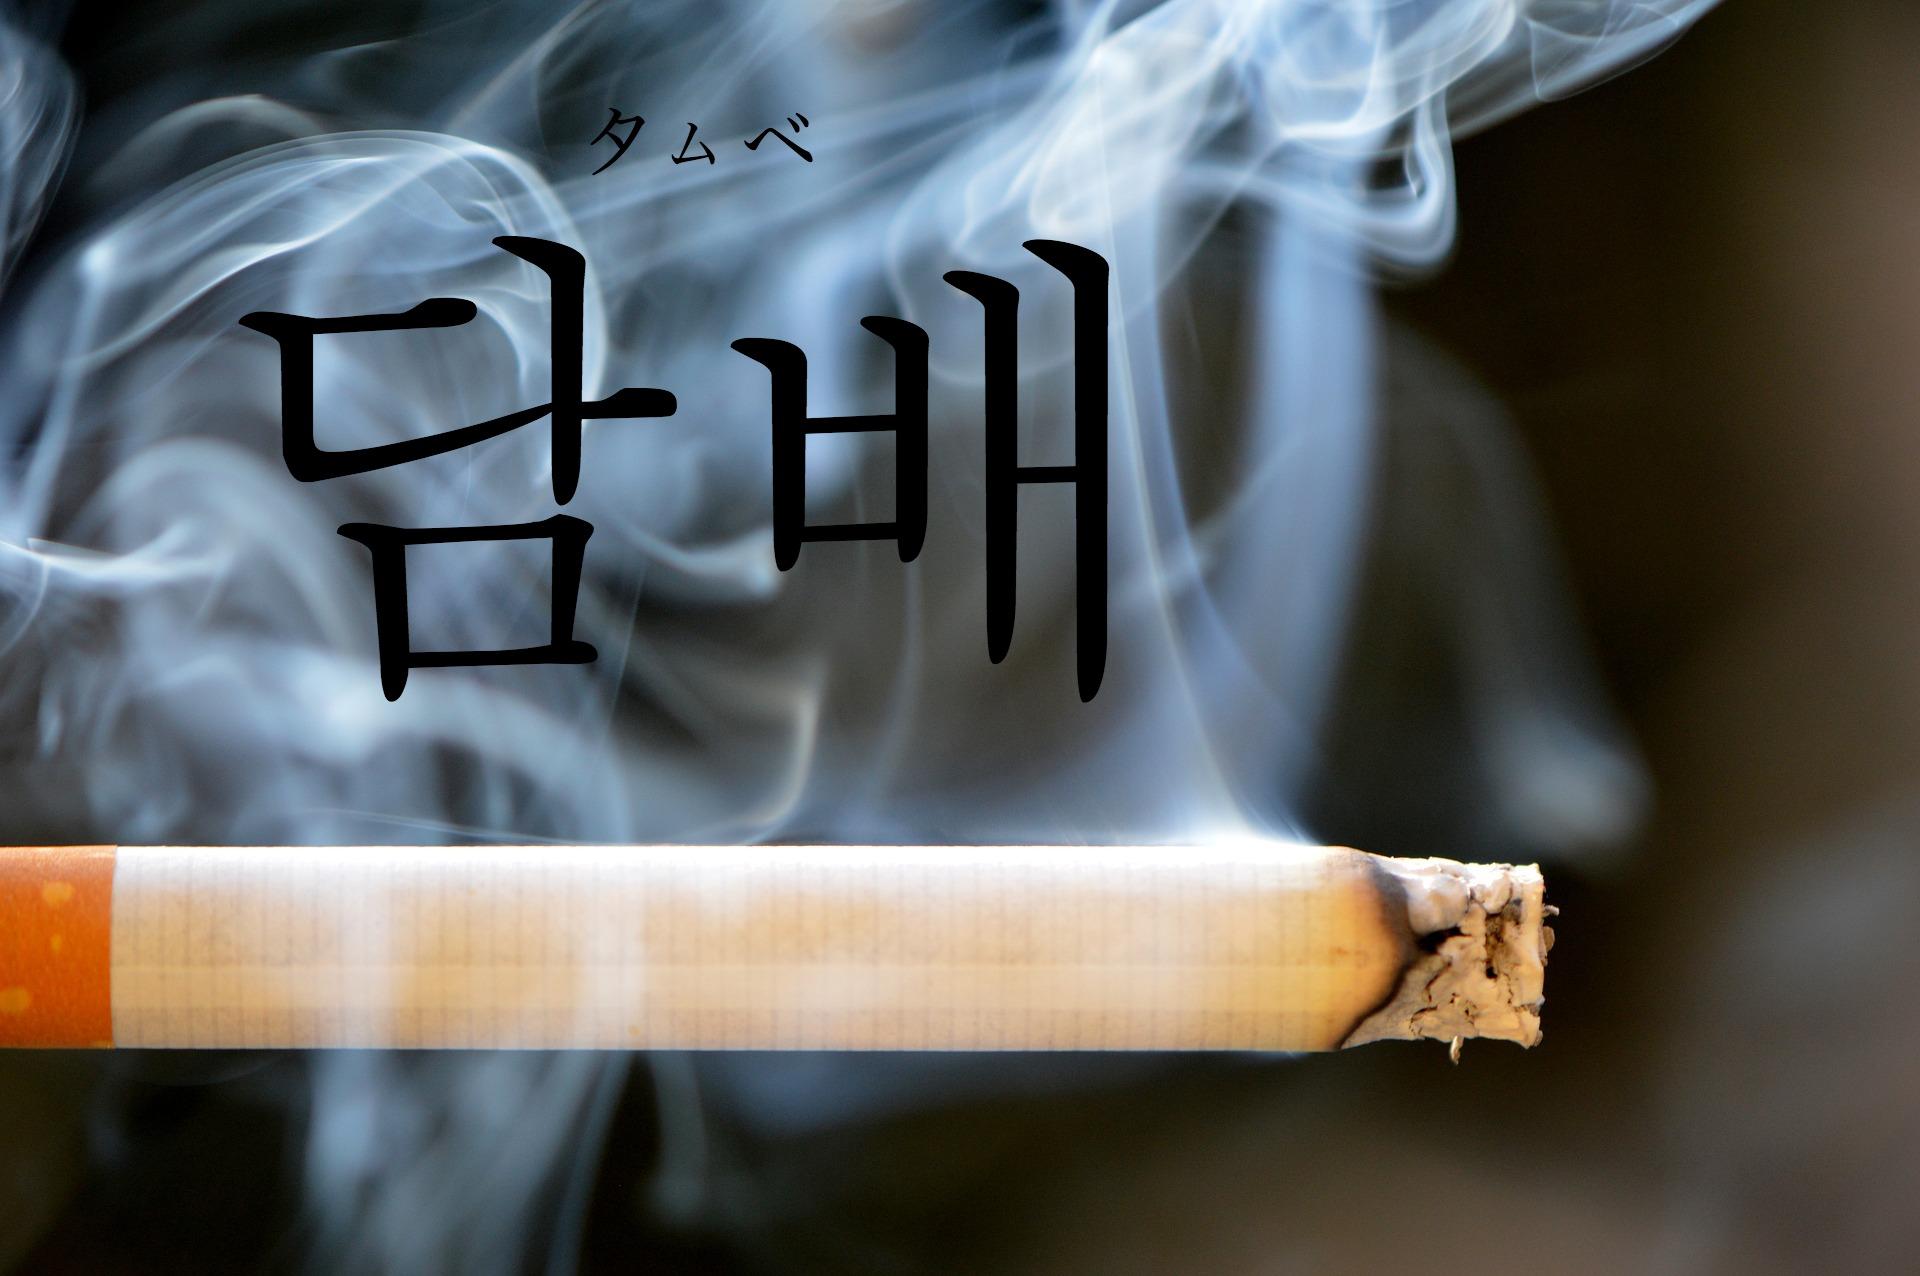 koreanword-cigarette